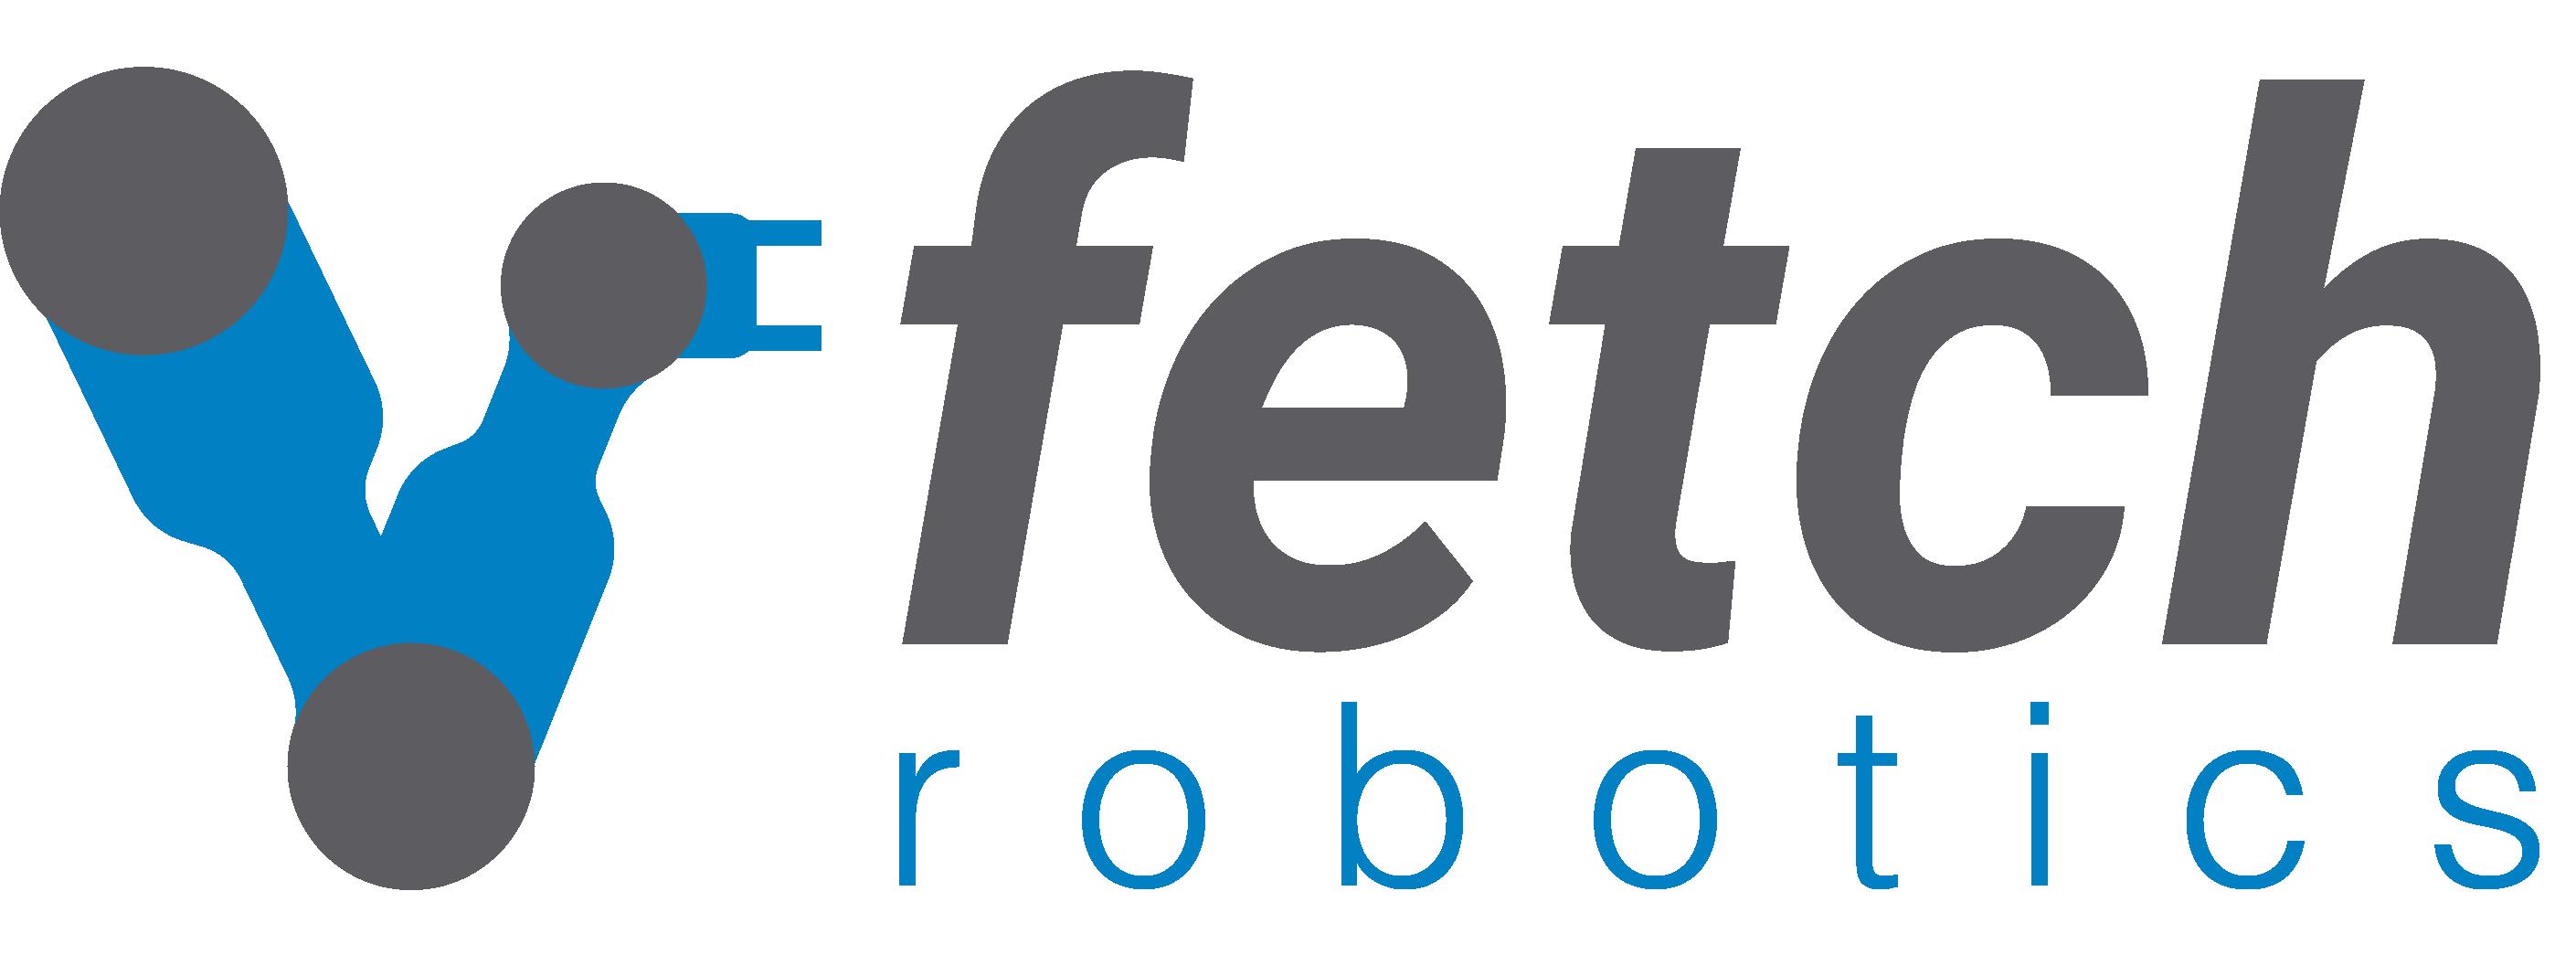 Fetch Robotics Teams up with SAP to Launch Virtual Conveyor Solution